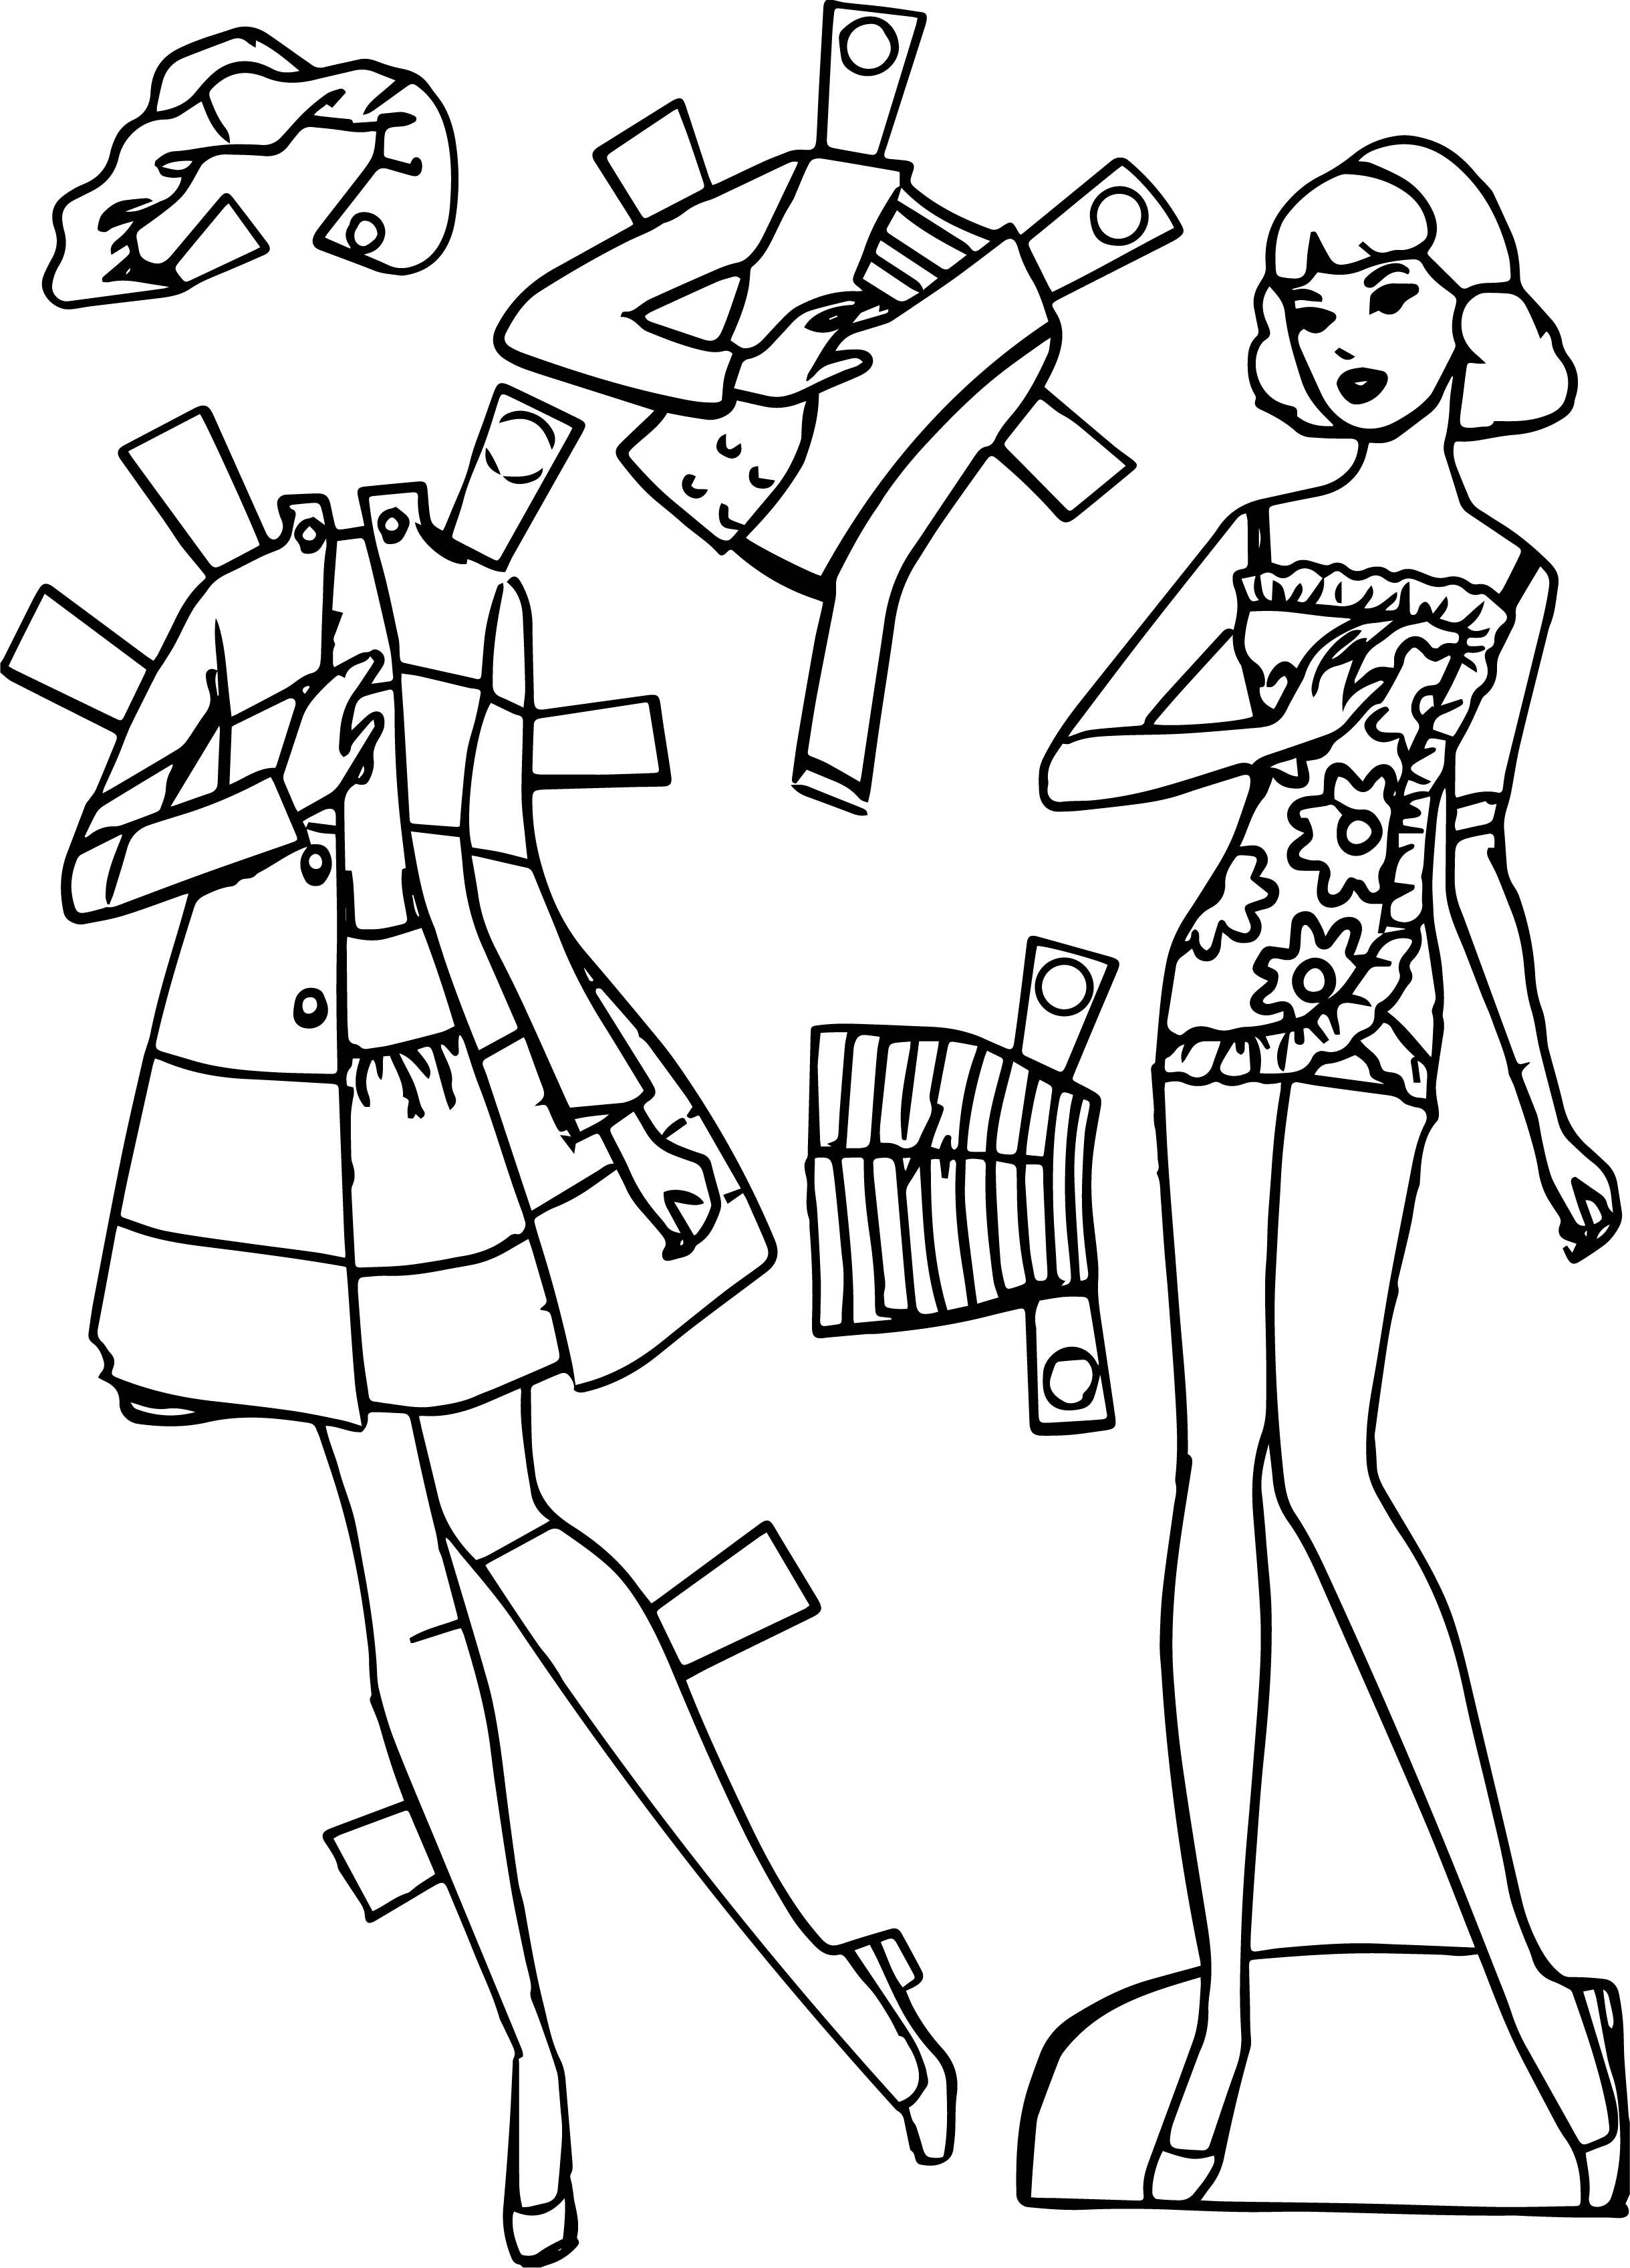 barbie logo coloring pages | Barbie Logo Coloring Coloring Pages